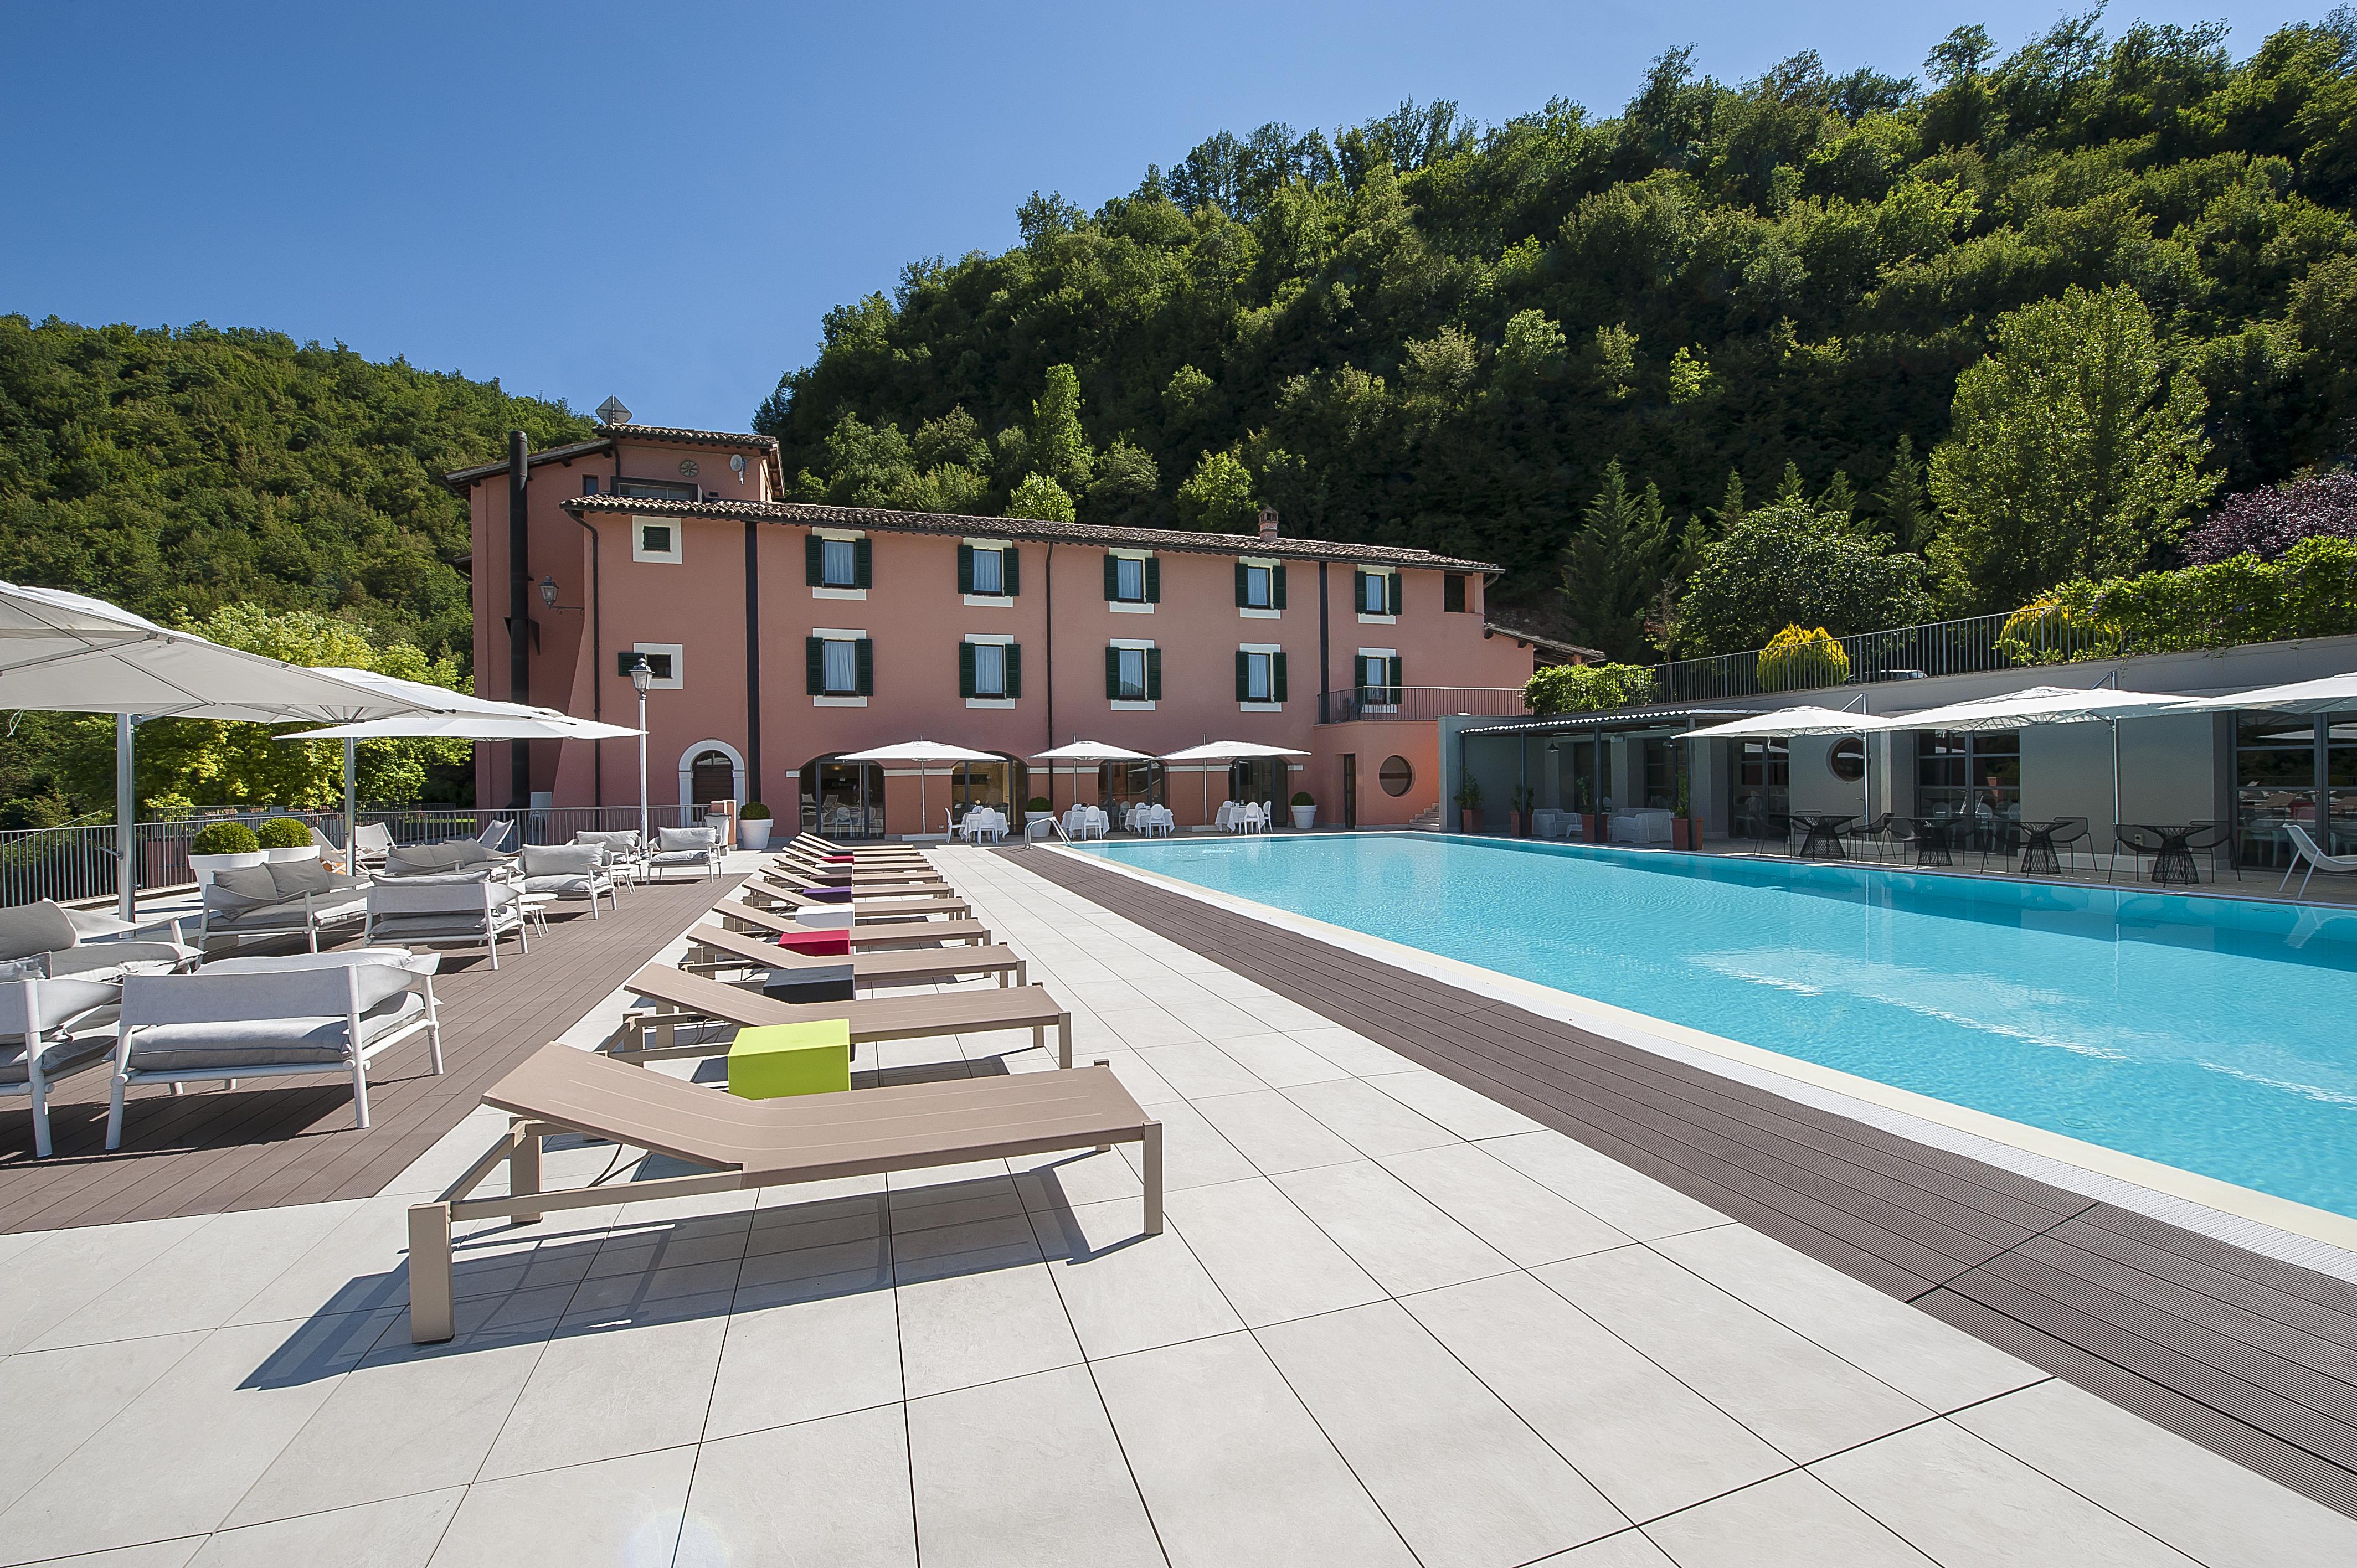 Magrelli Hotels & Restaurants